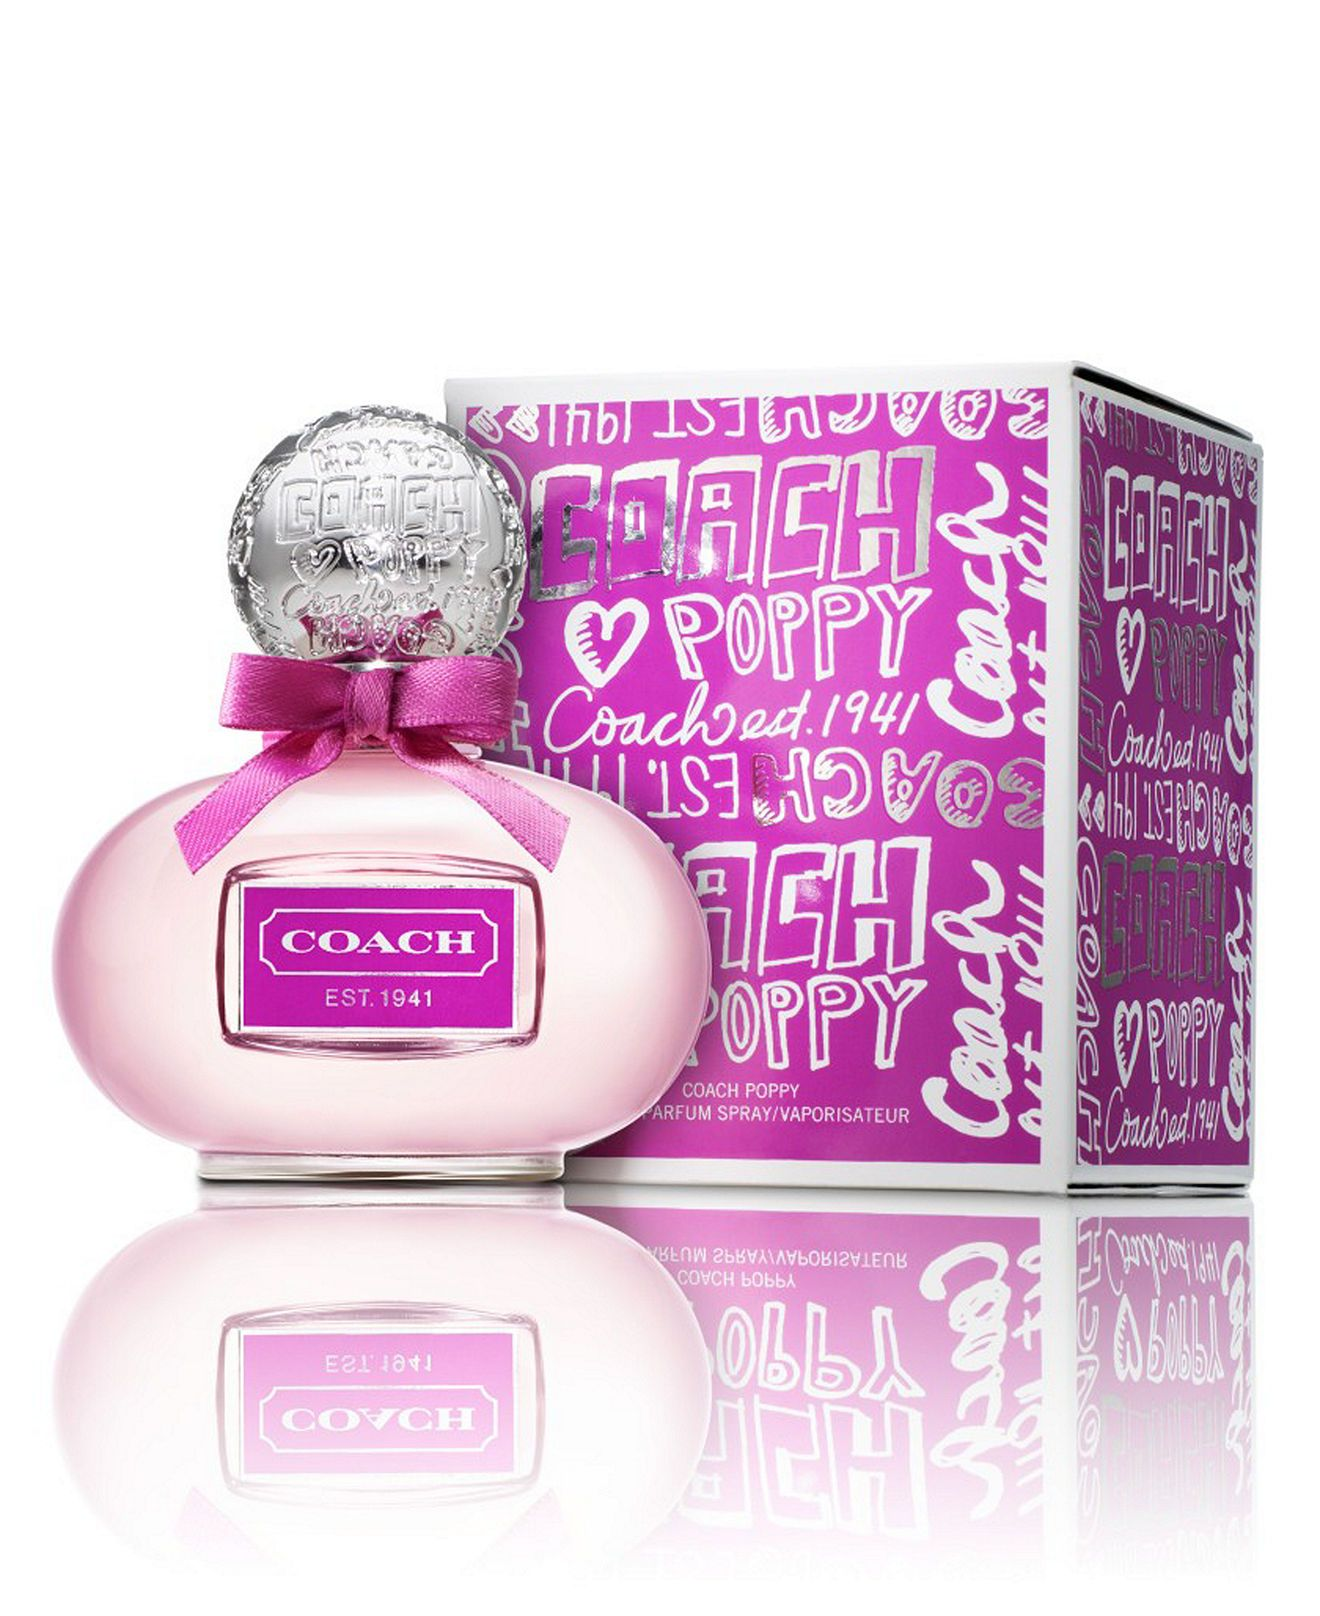 COACH Poppy Flower Fragrance Collection for Women Flower